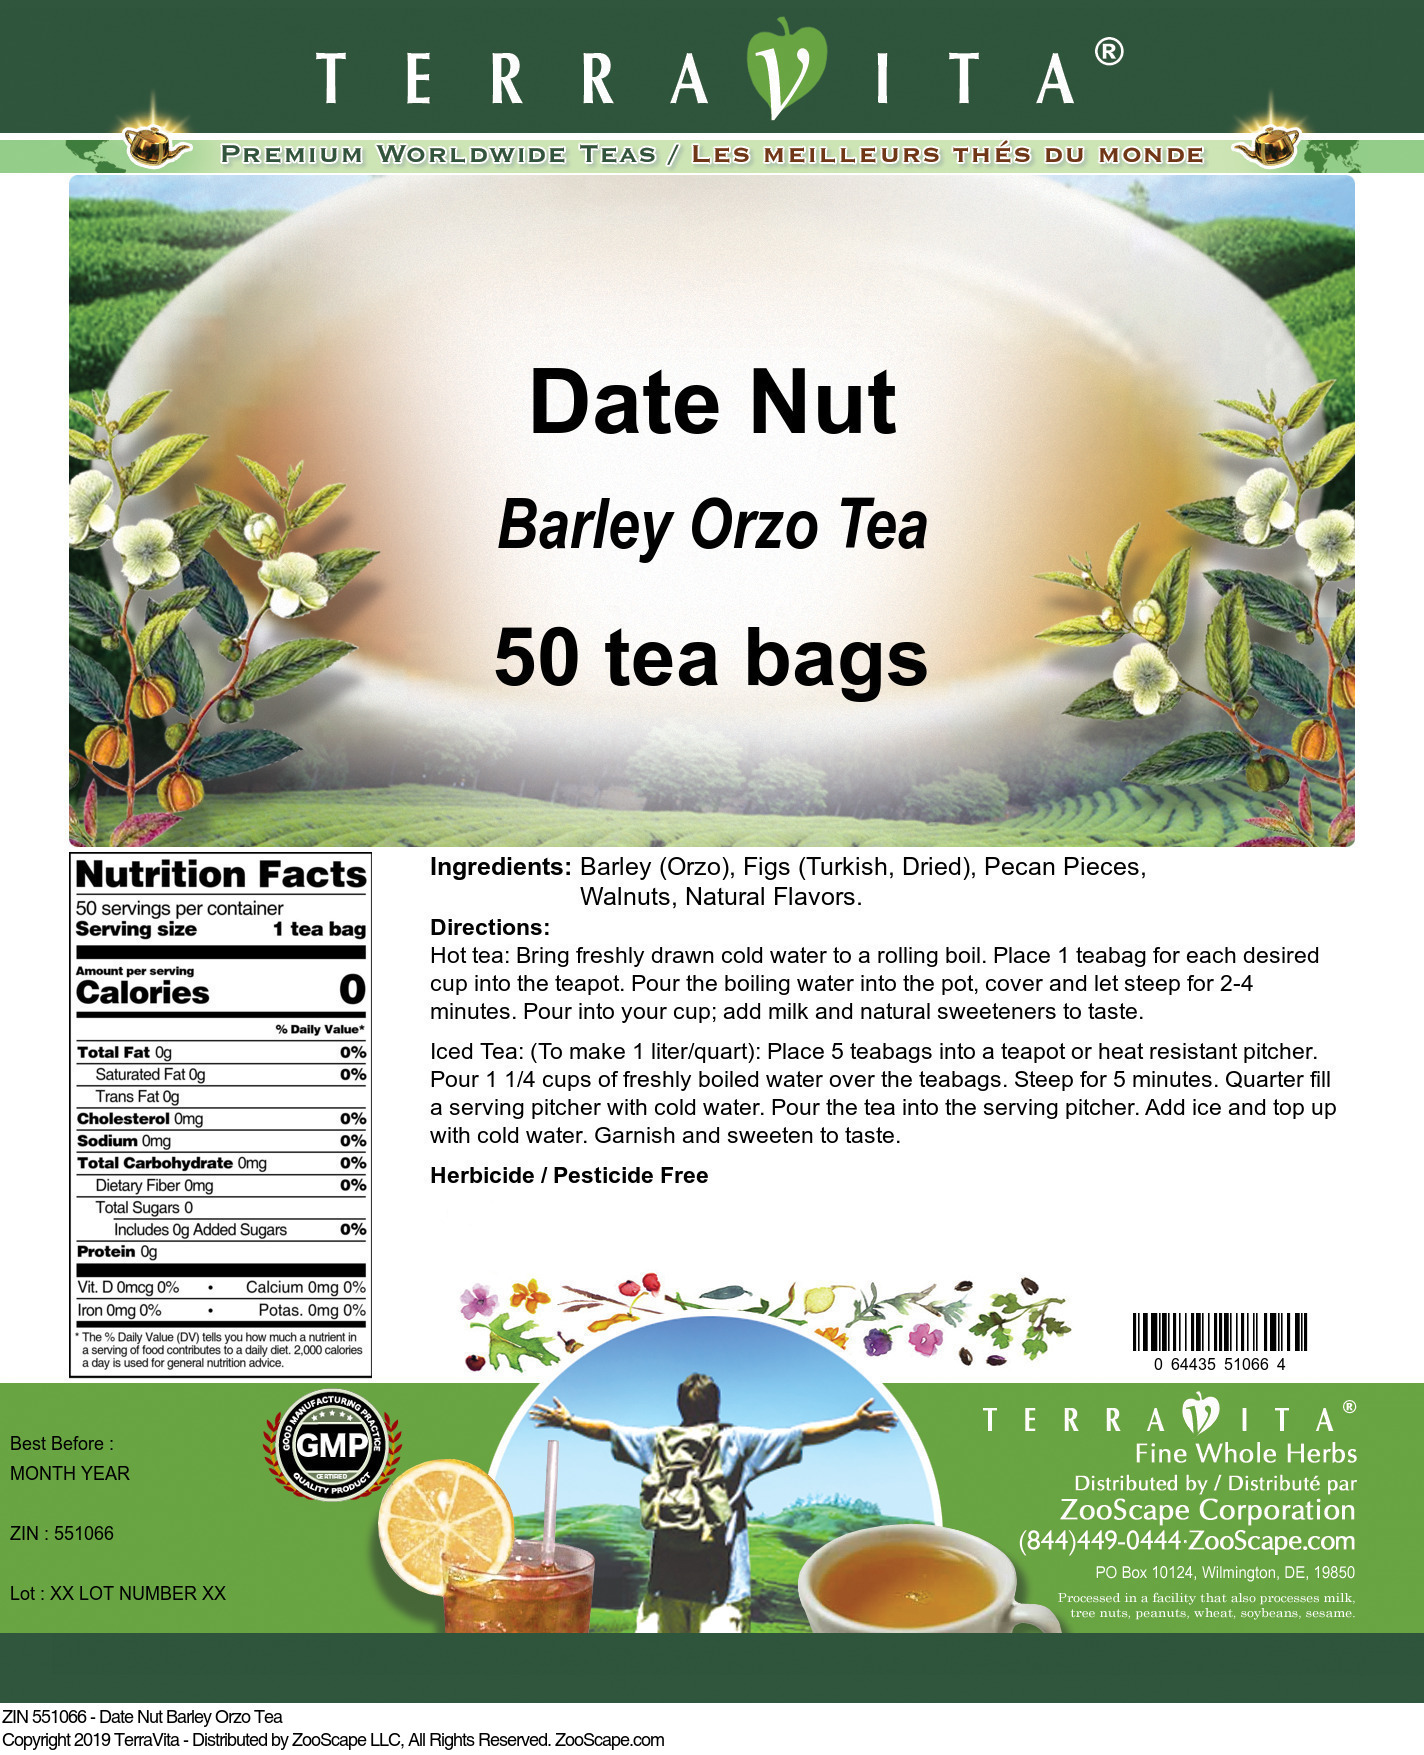 Date Nut Barley Orzo